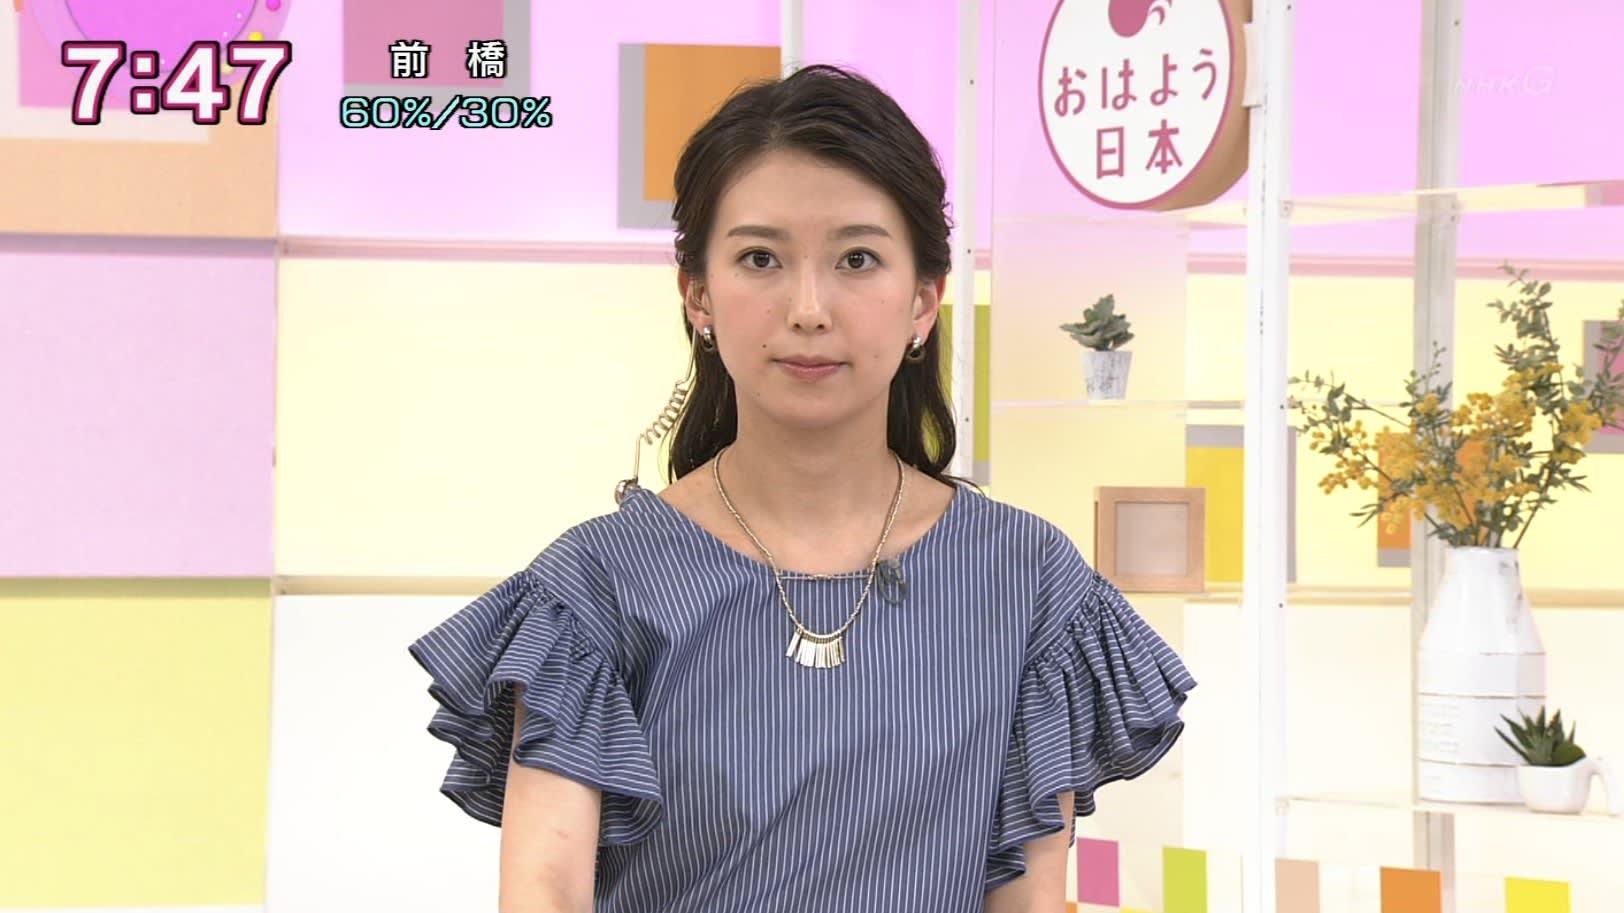 和久田麻由子ファン Part24 [無断転載禁止]©2ch.netYouTube動画>1本 ->画像>2322枚